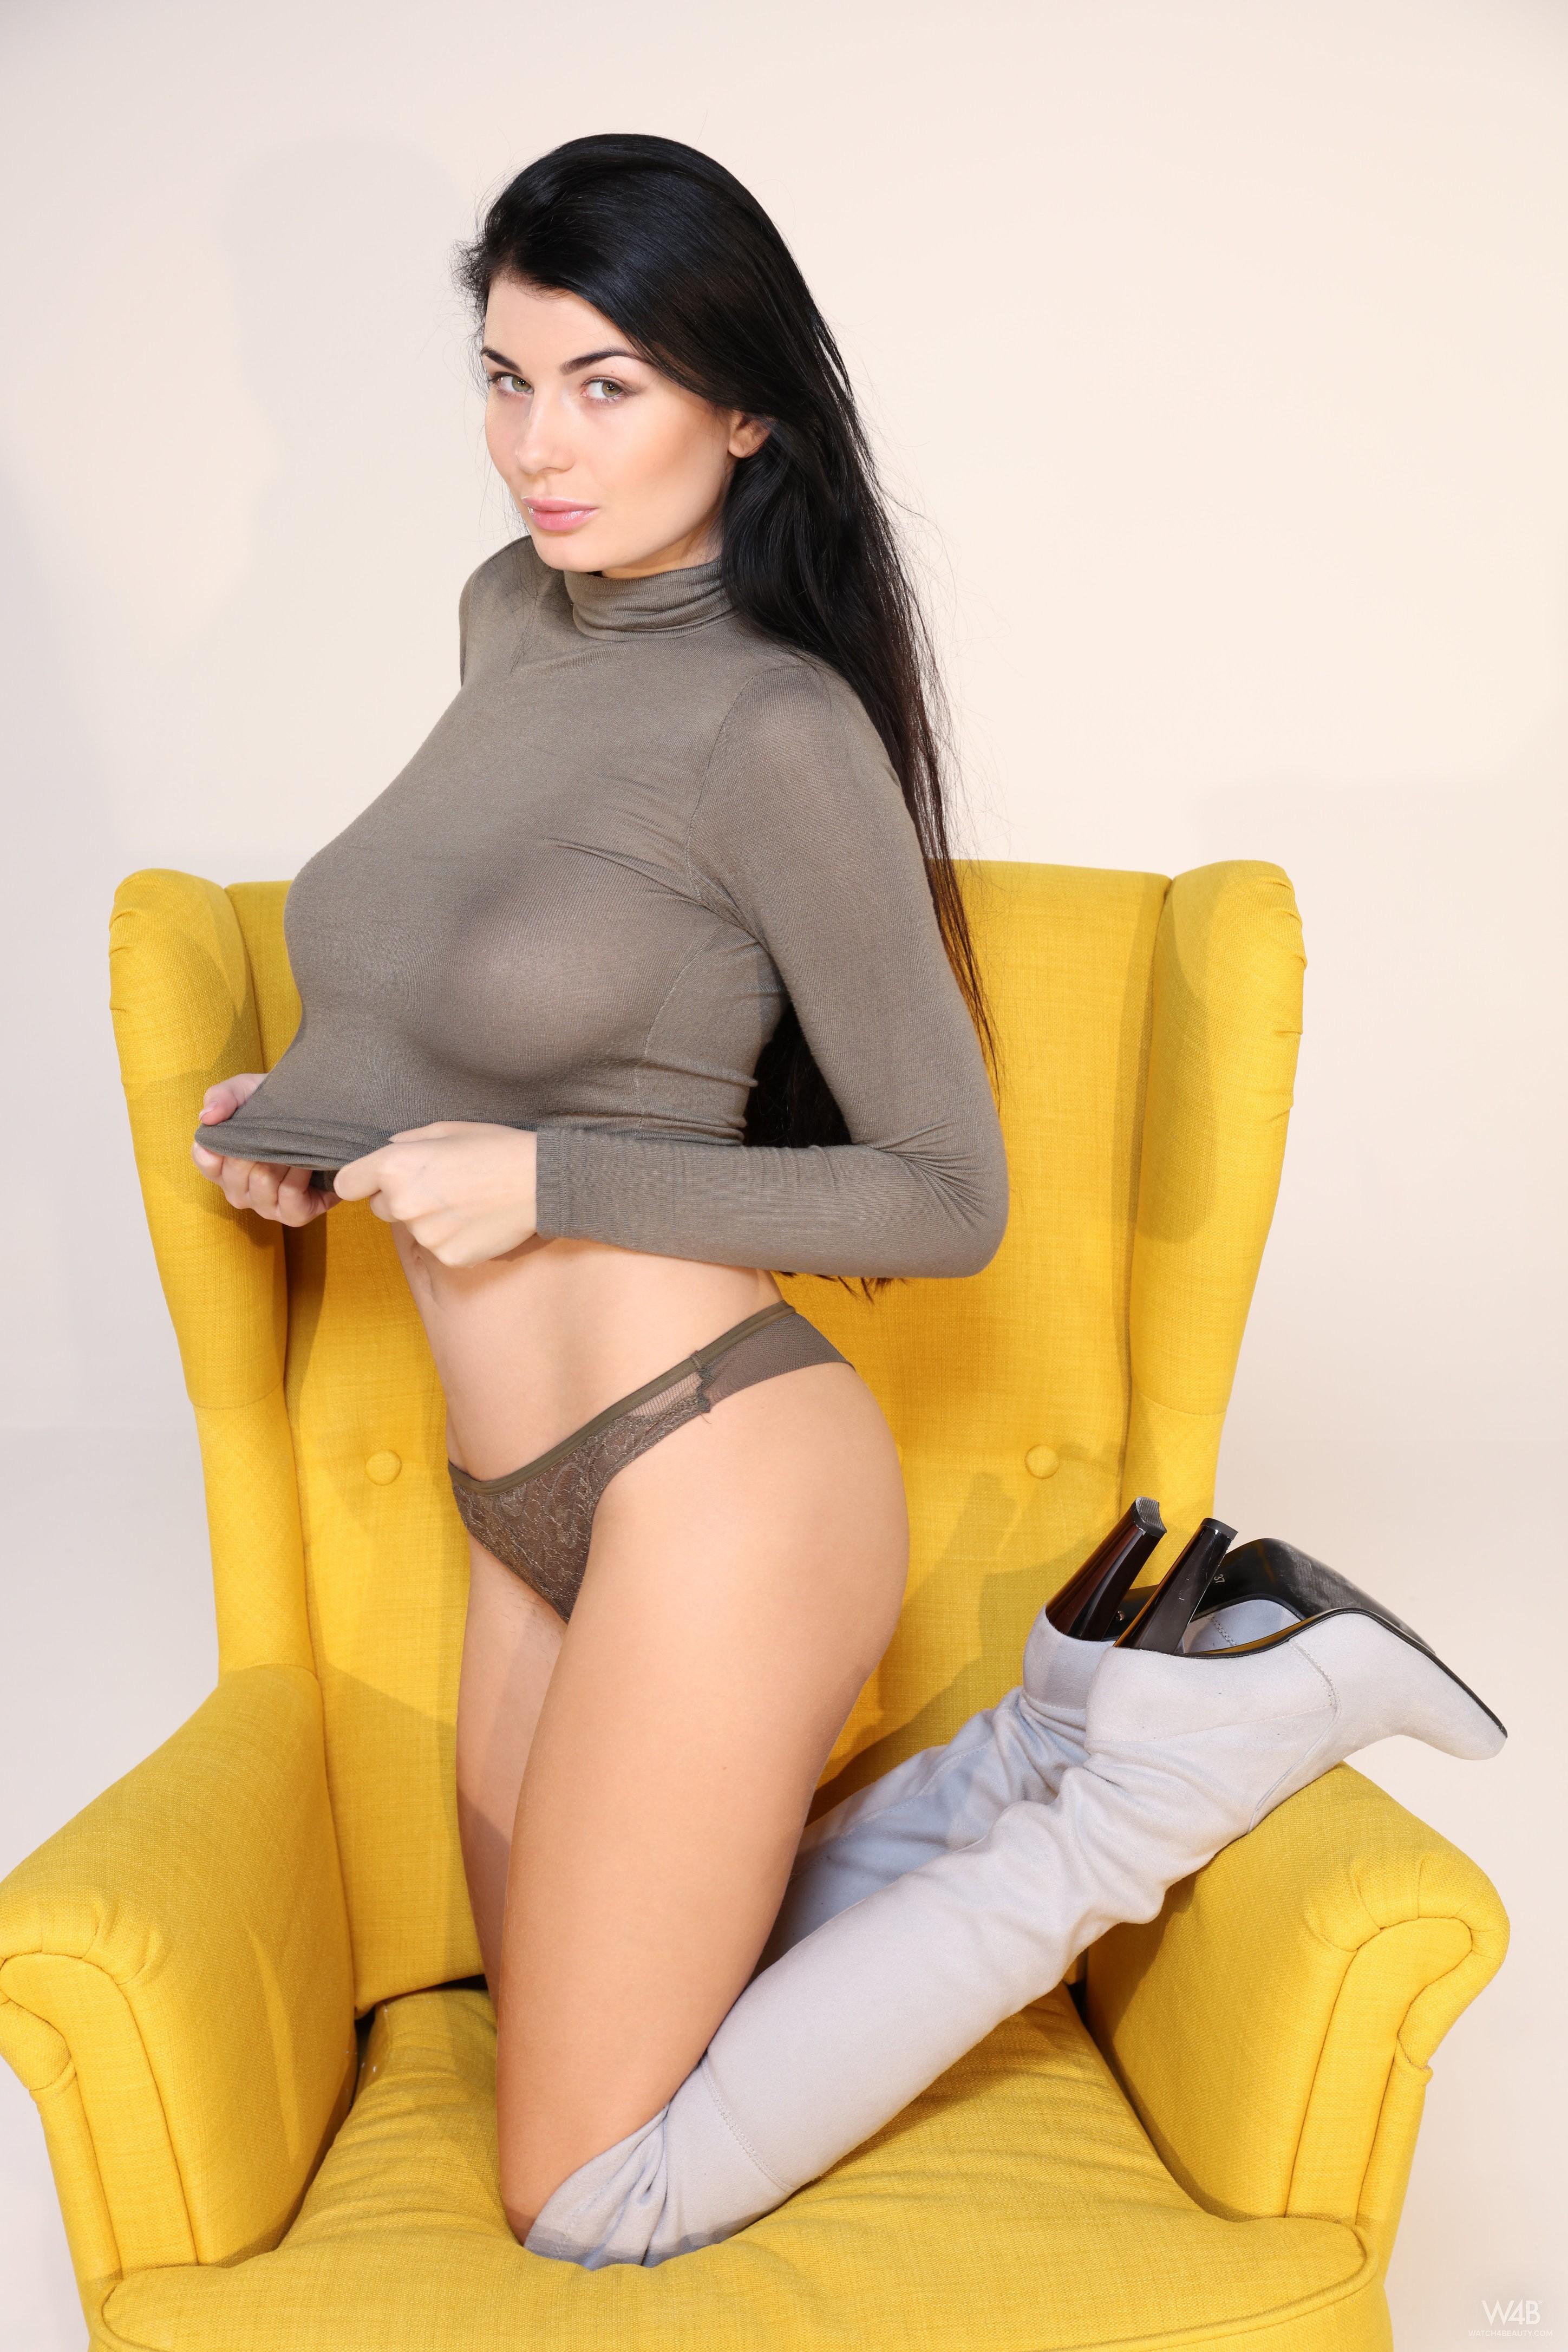 People 2896x4344 Lucy Li model women brunette Watch4Beauty pornstar lingerie boots knee-high boots see-through clothing boobs big boobs natural boobs no bra